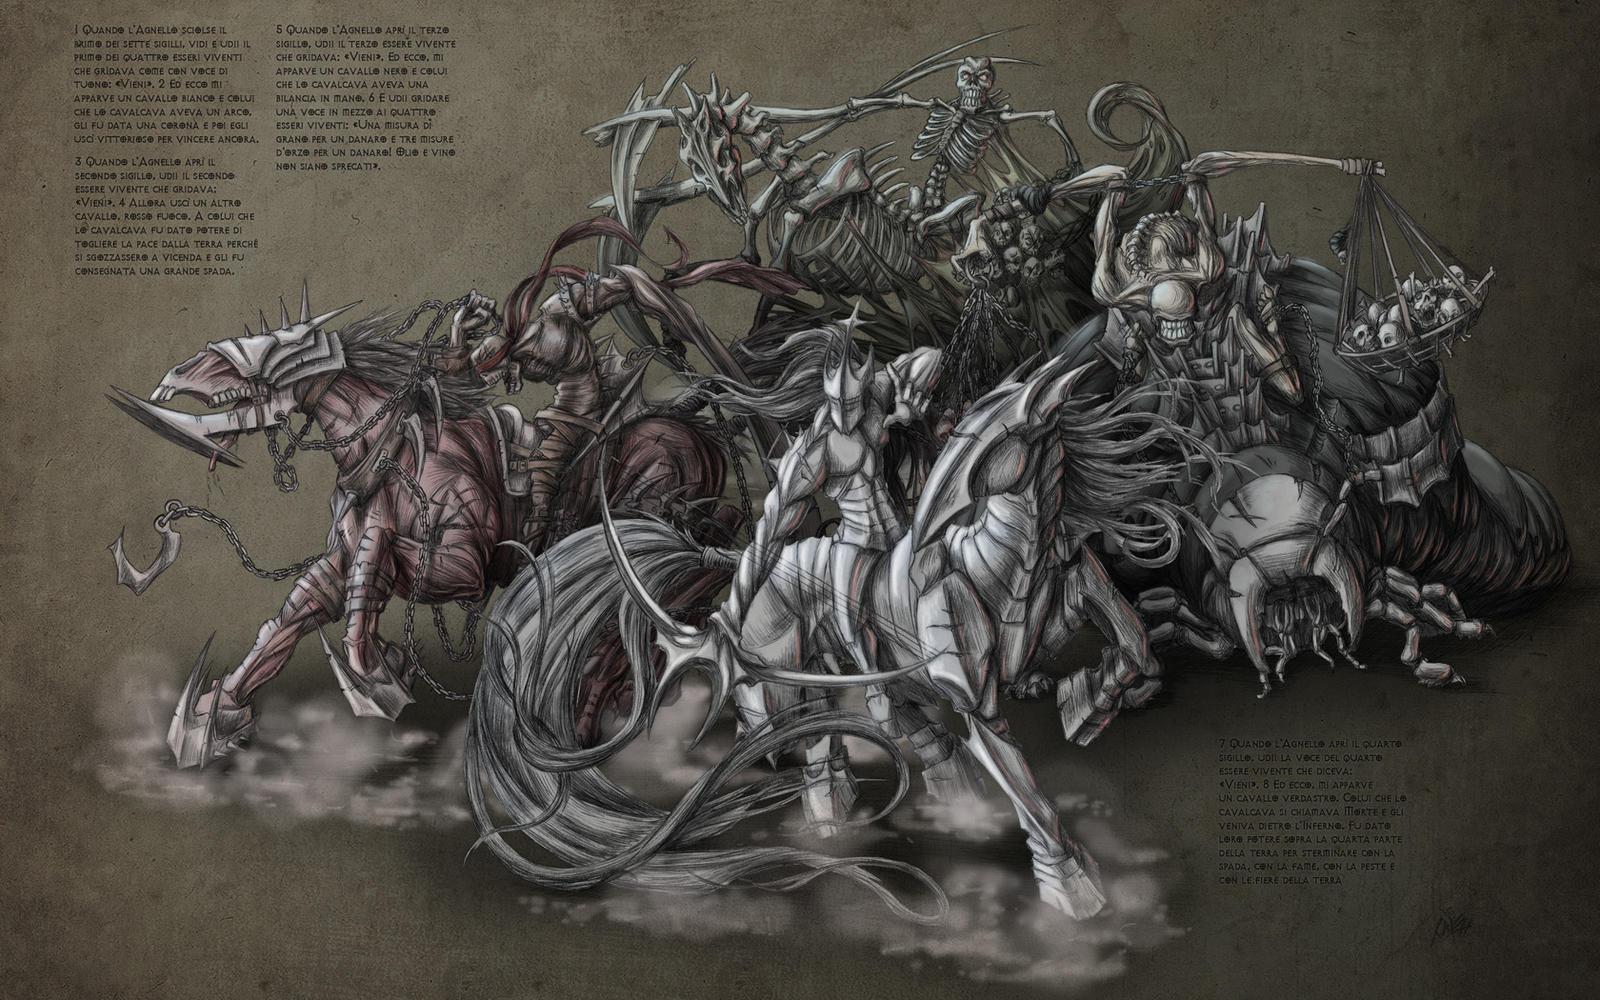 http://img01.deviantart.net/5749/i/2008/226/5/f/four_horsemen_of_apocalypse_by_bigtaki.jpg